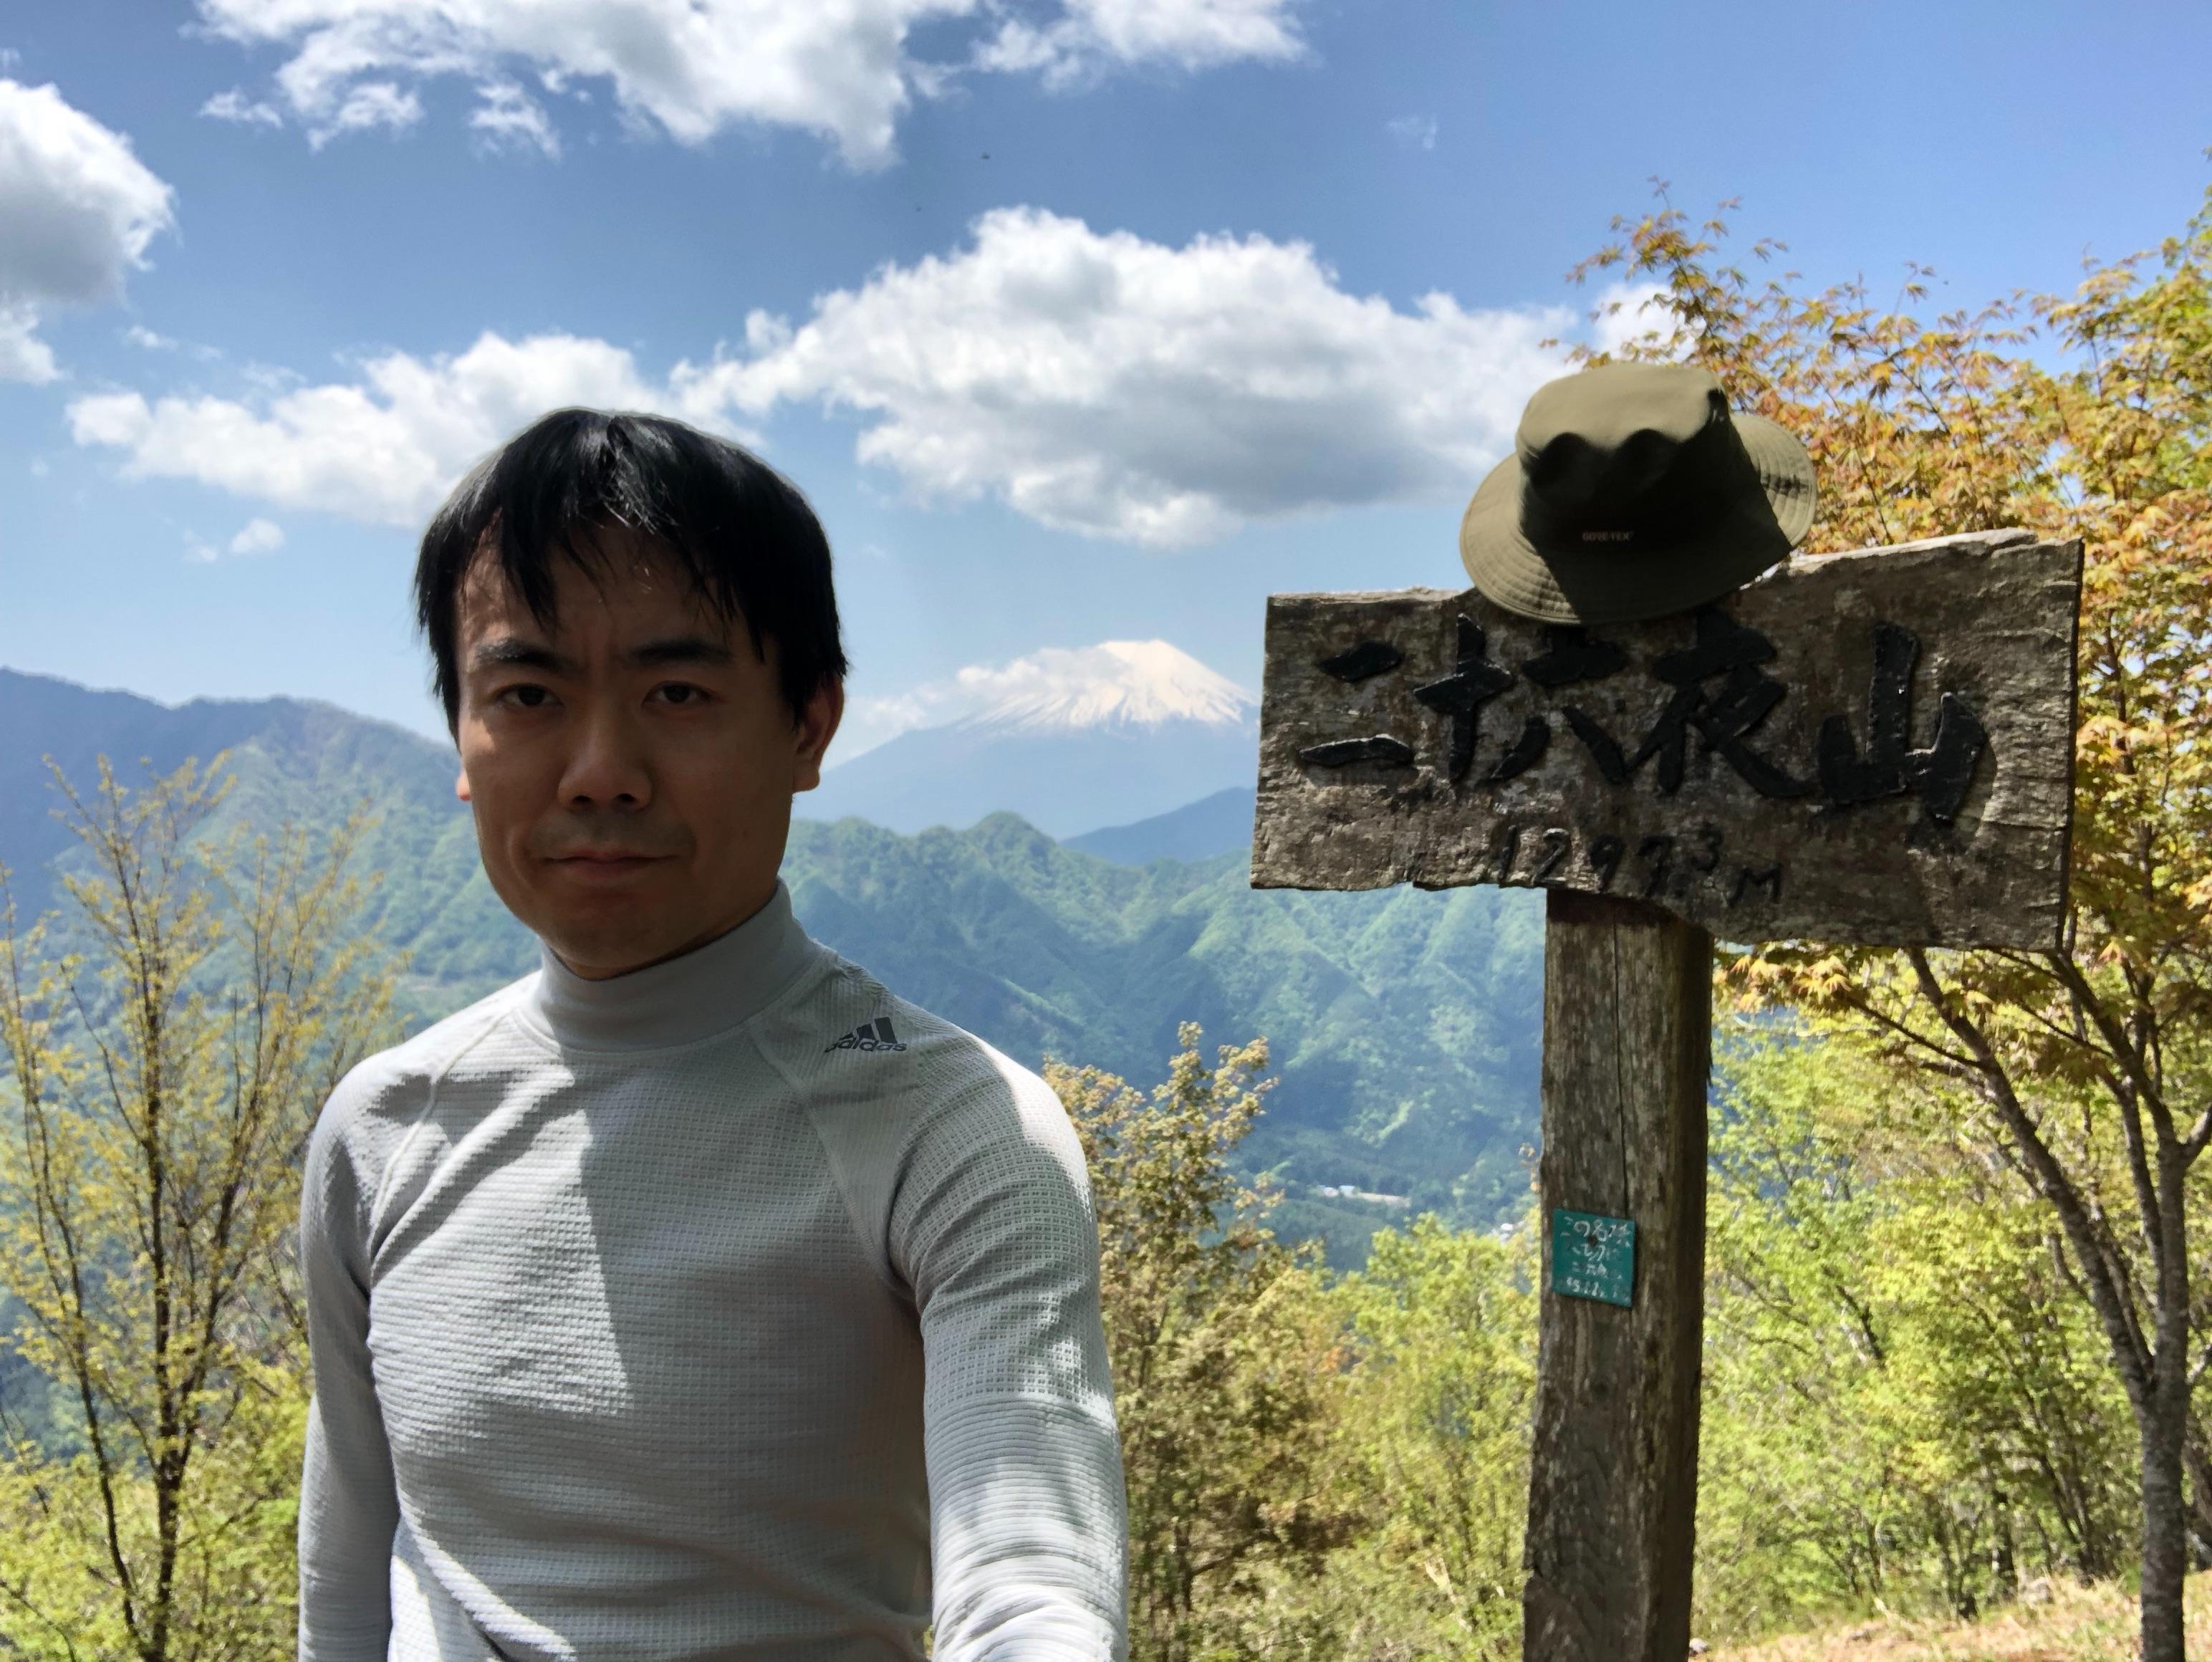 f:id:yanakahachisuke:20180430005535j:image